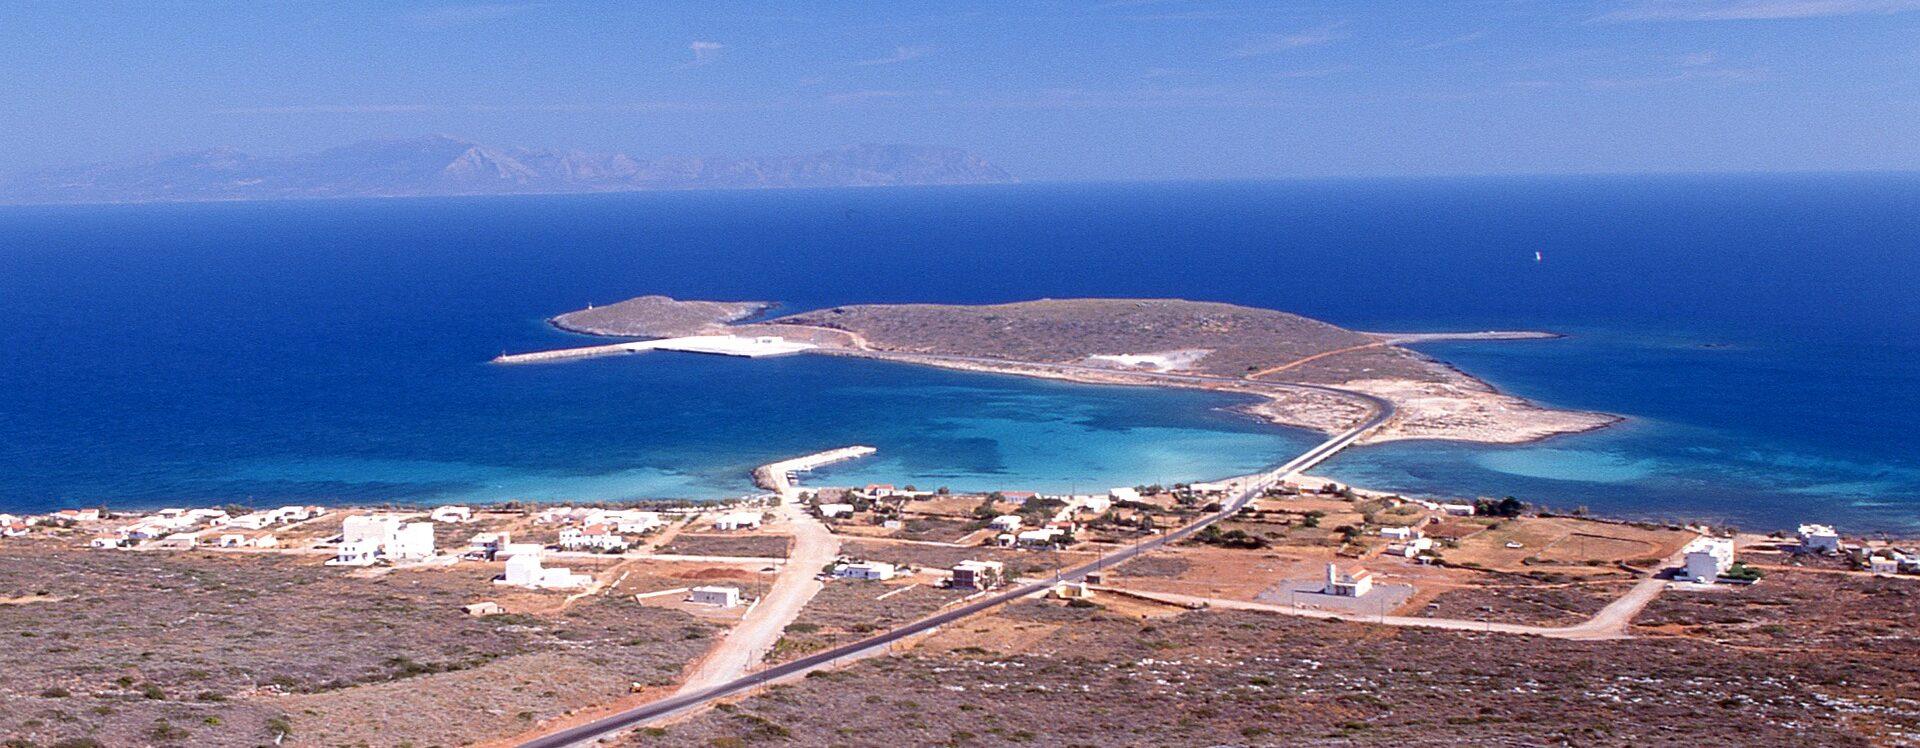 Diakofti: An earthly paradise well worth a visit